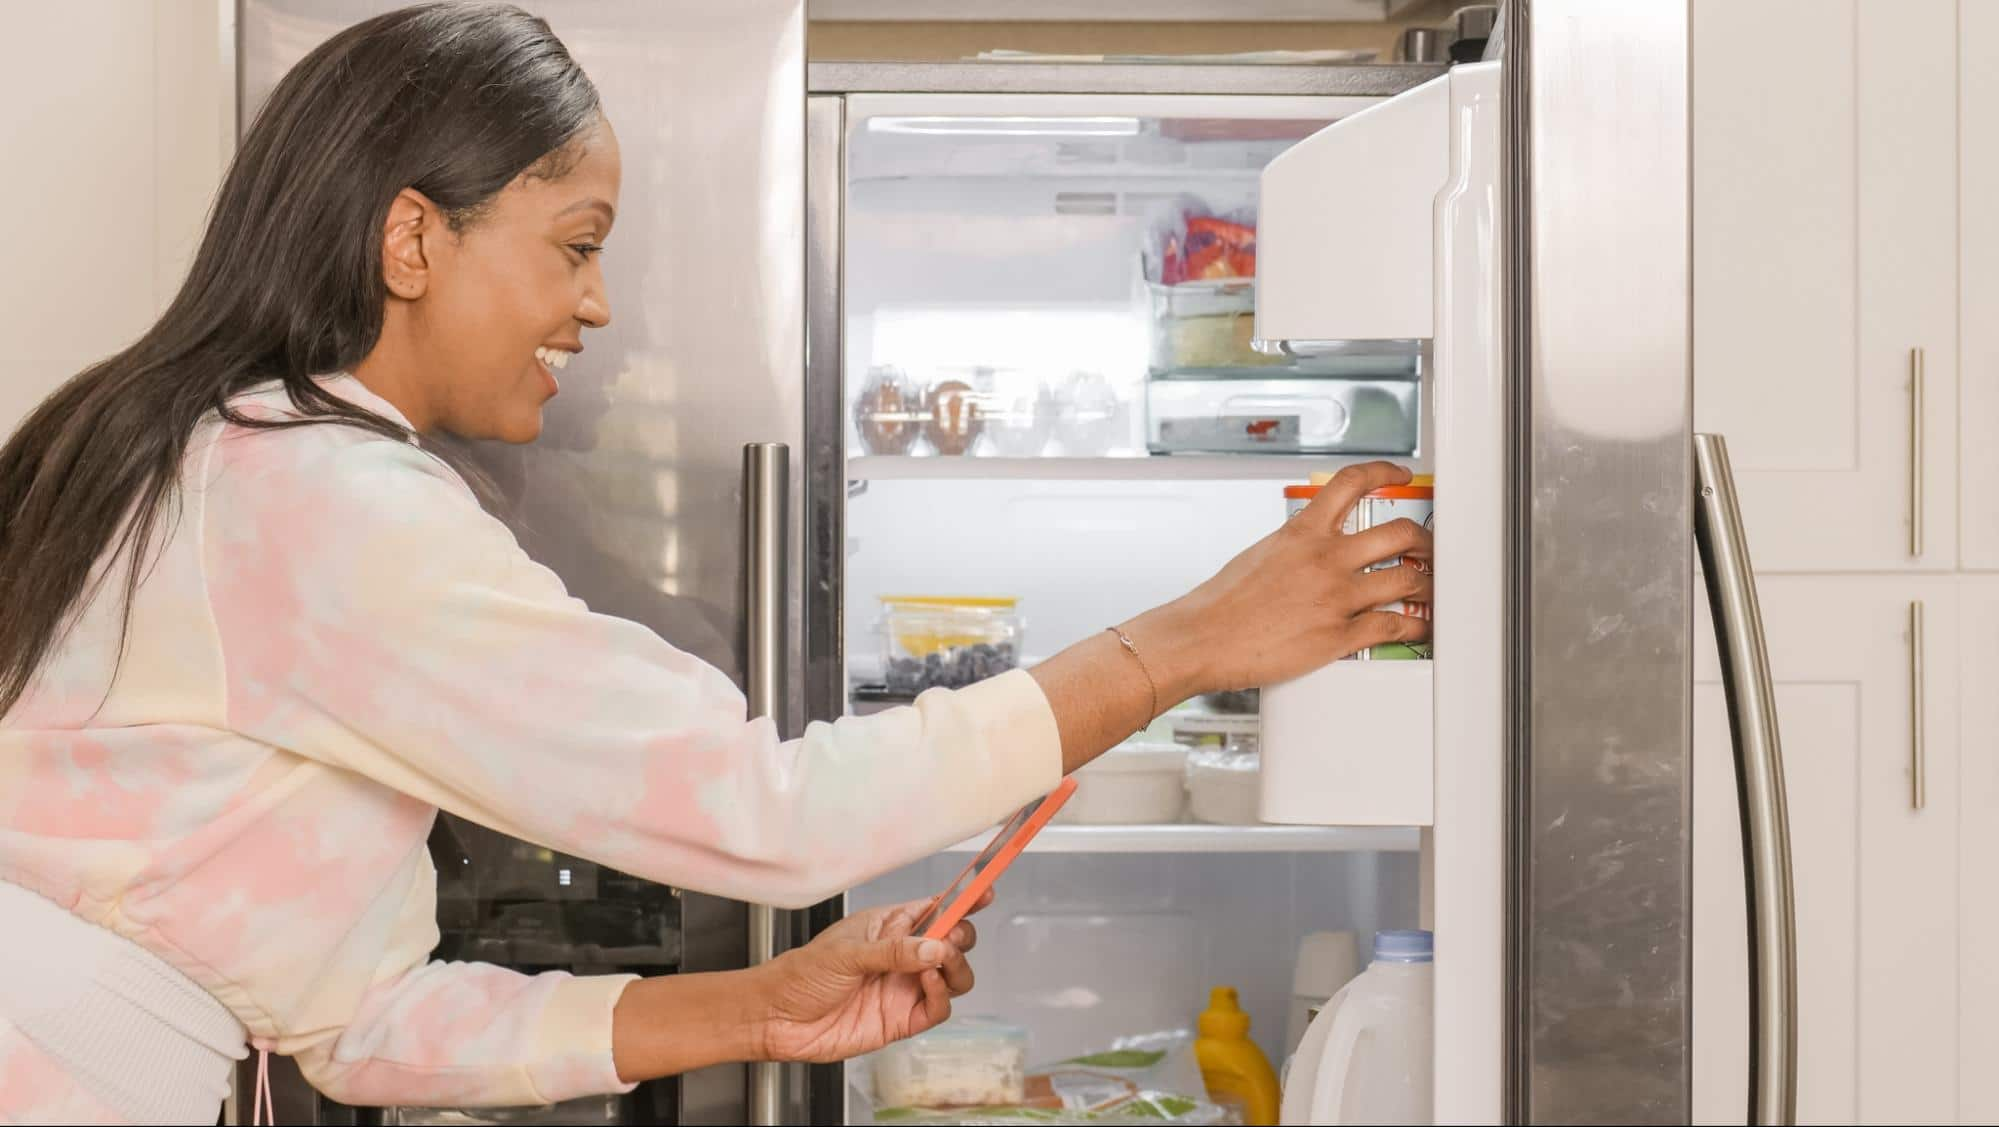 Black Woman getting in refrigerator, reaching for yogurt